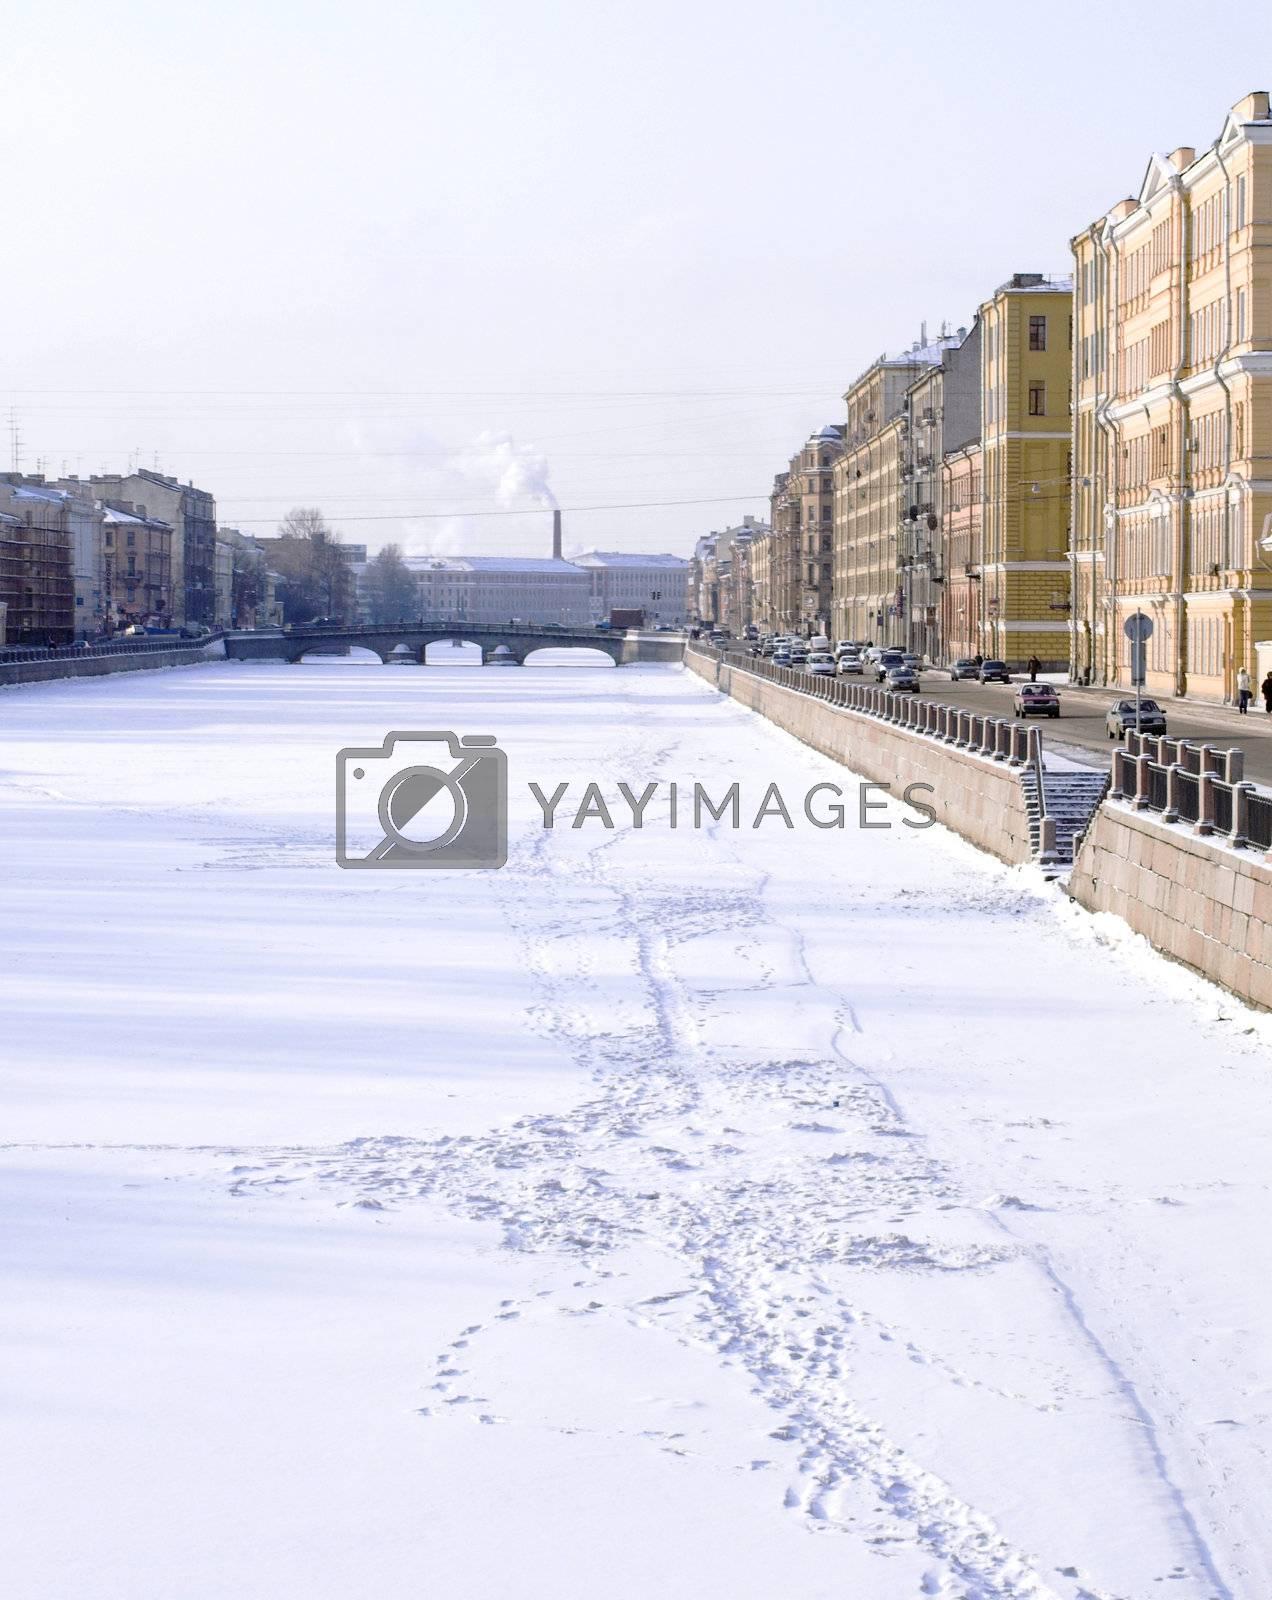 Fontanka embankment near the Obukhovsky bridge in Saint Petersburg, Russia.